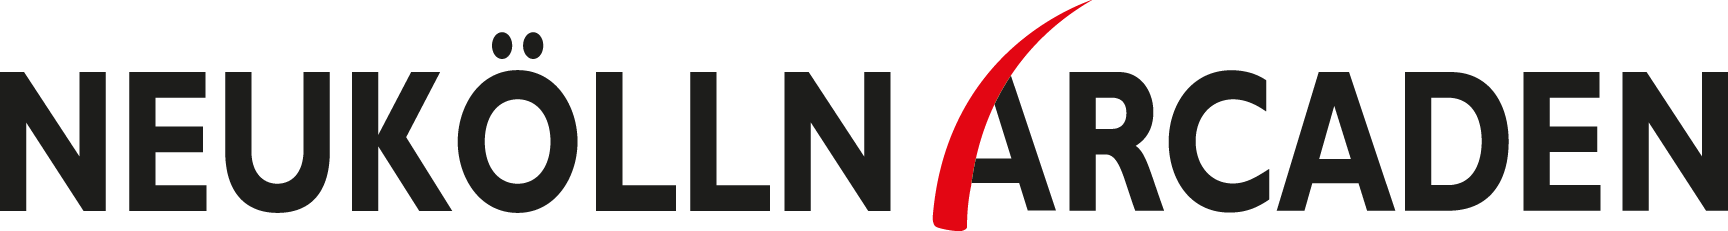 Neukölln Arcaden Logo